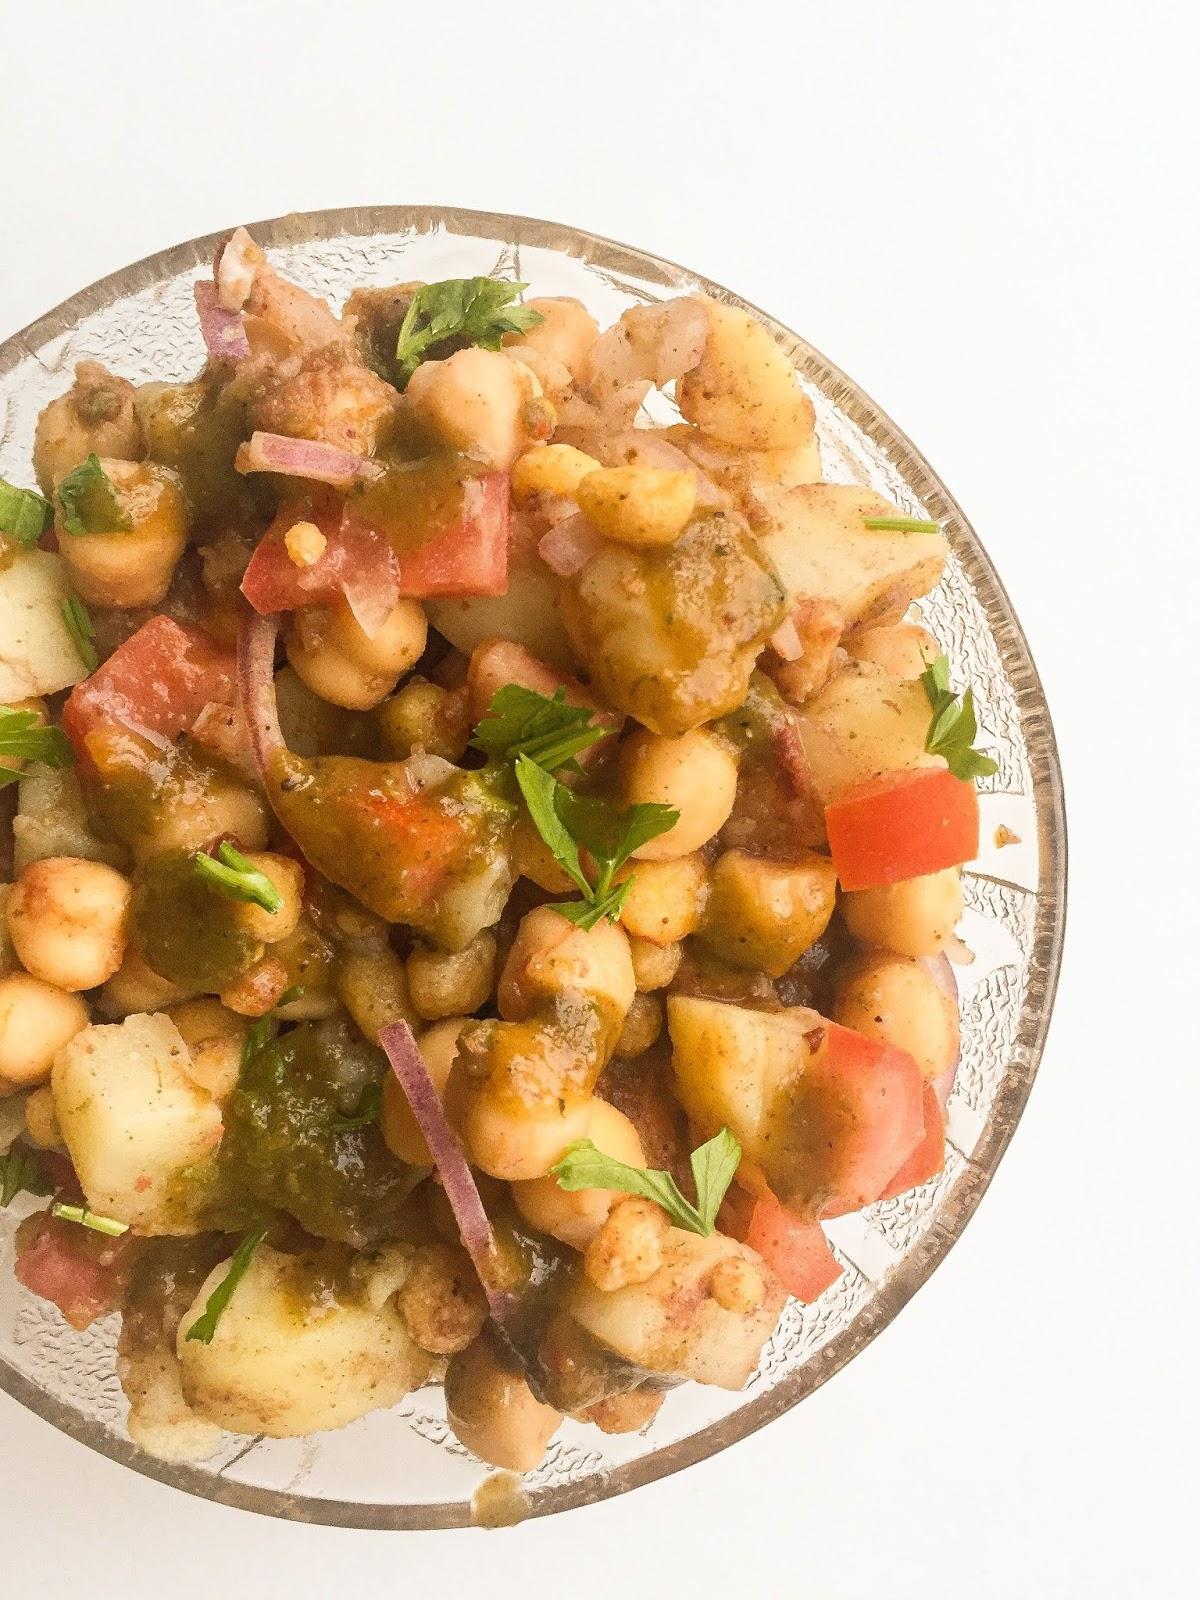 mama's potato and chickpea salad